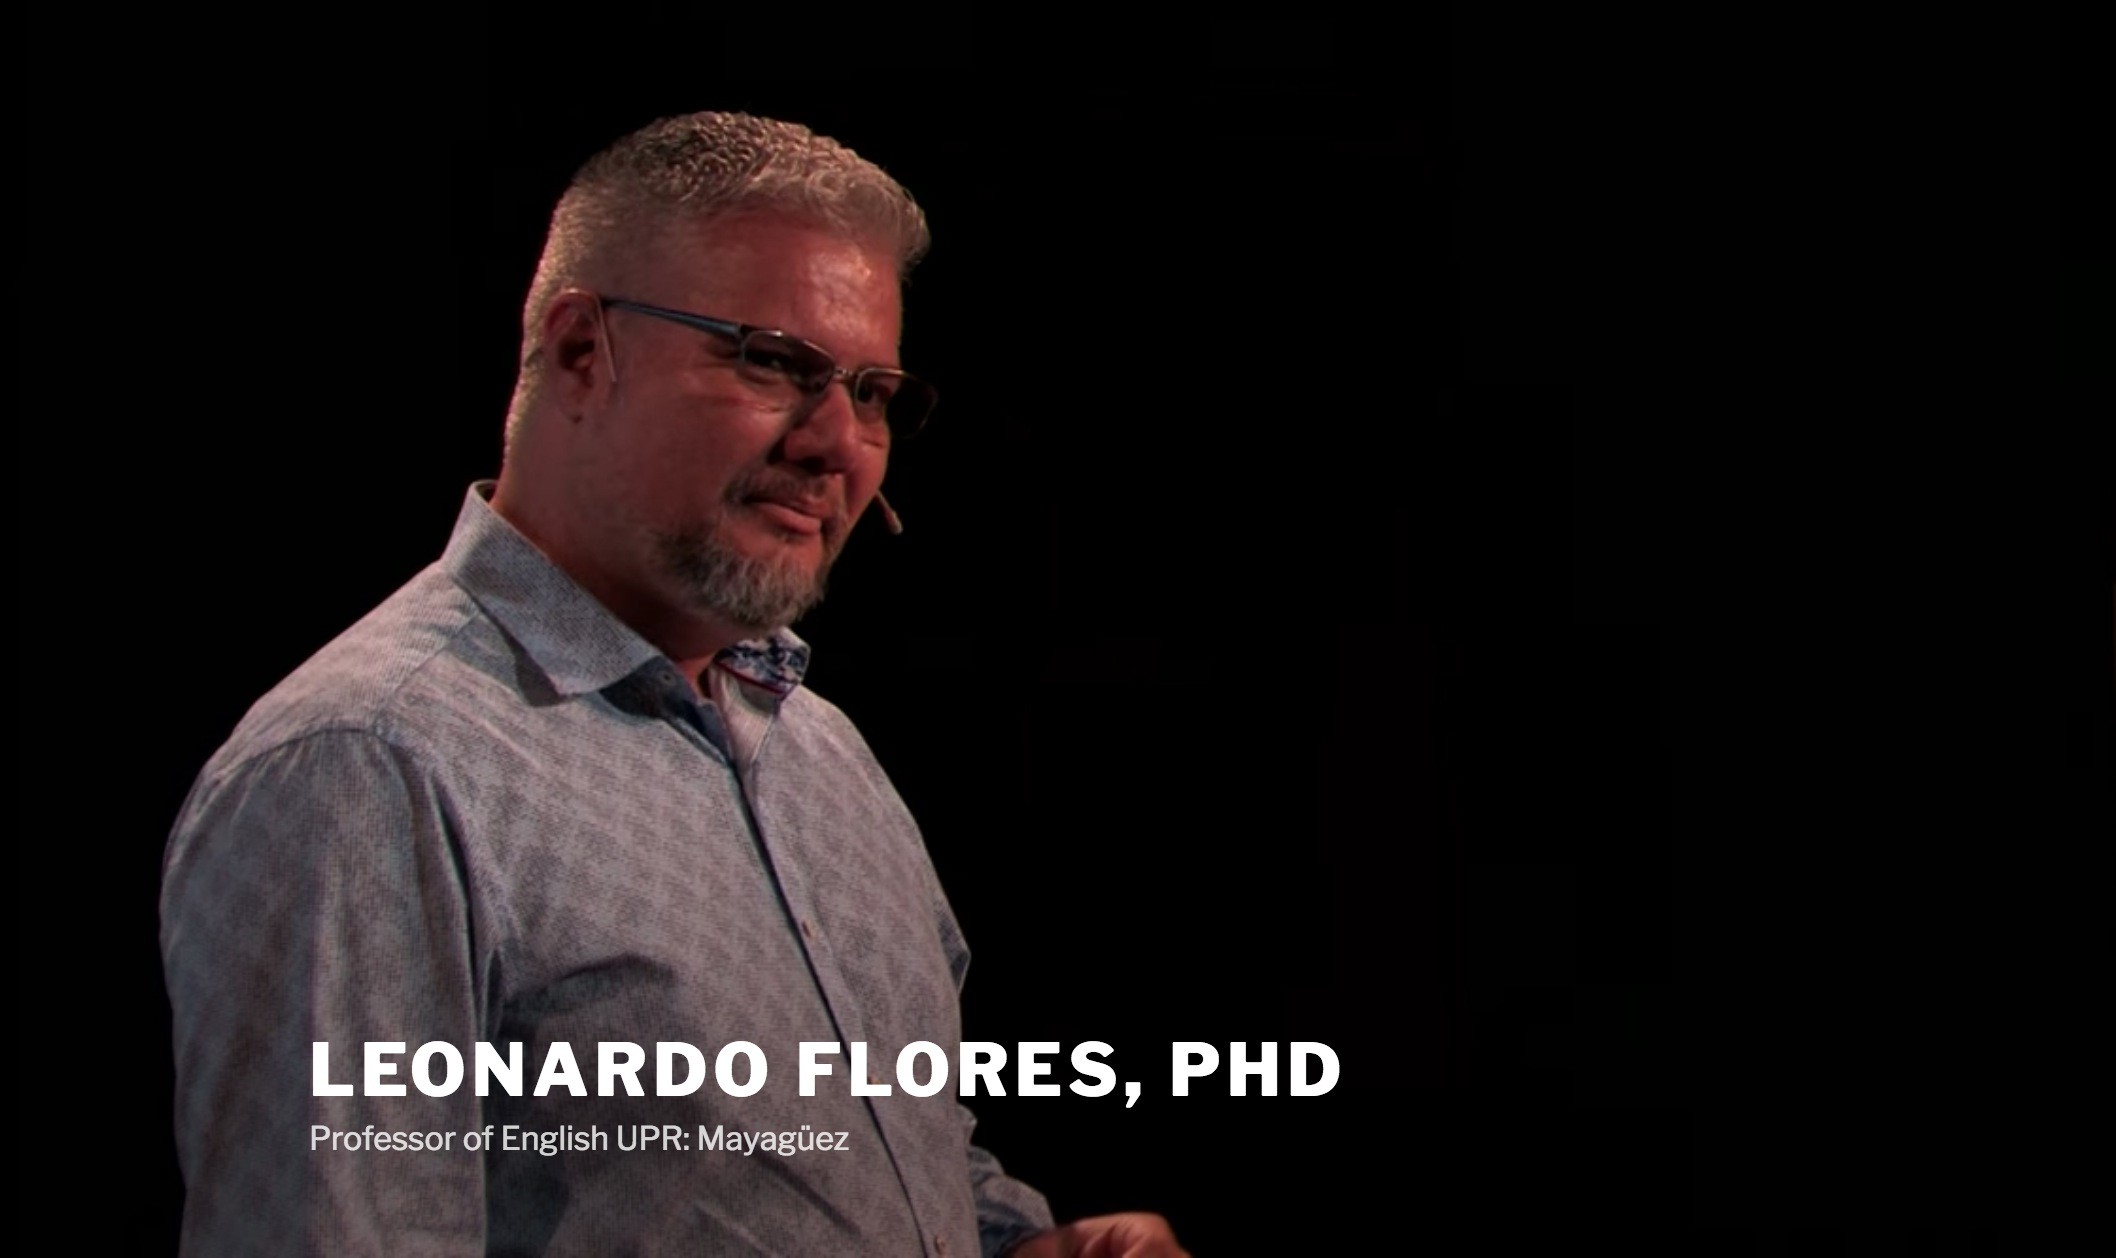 Leonardo Flores (Jan 31 @ 1PM EST)